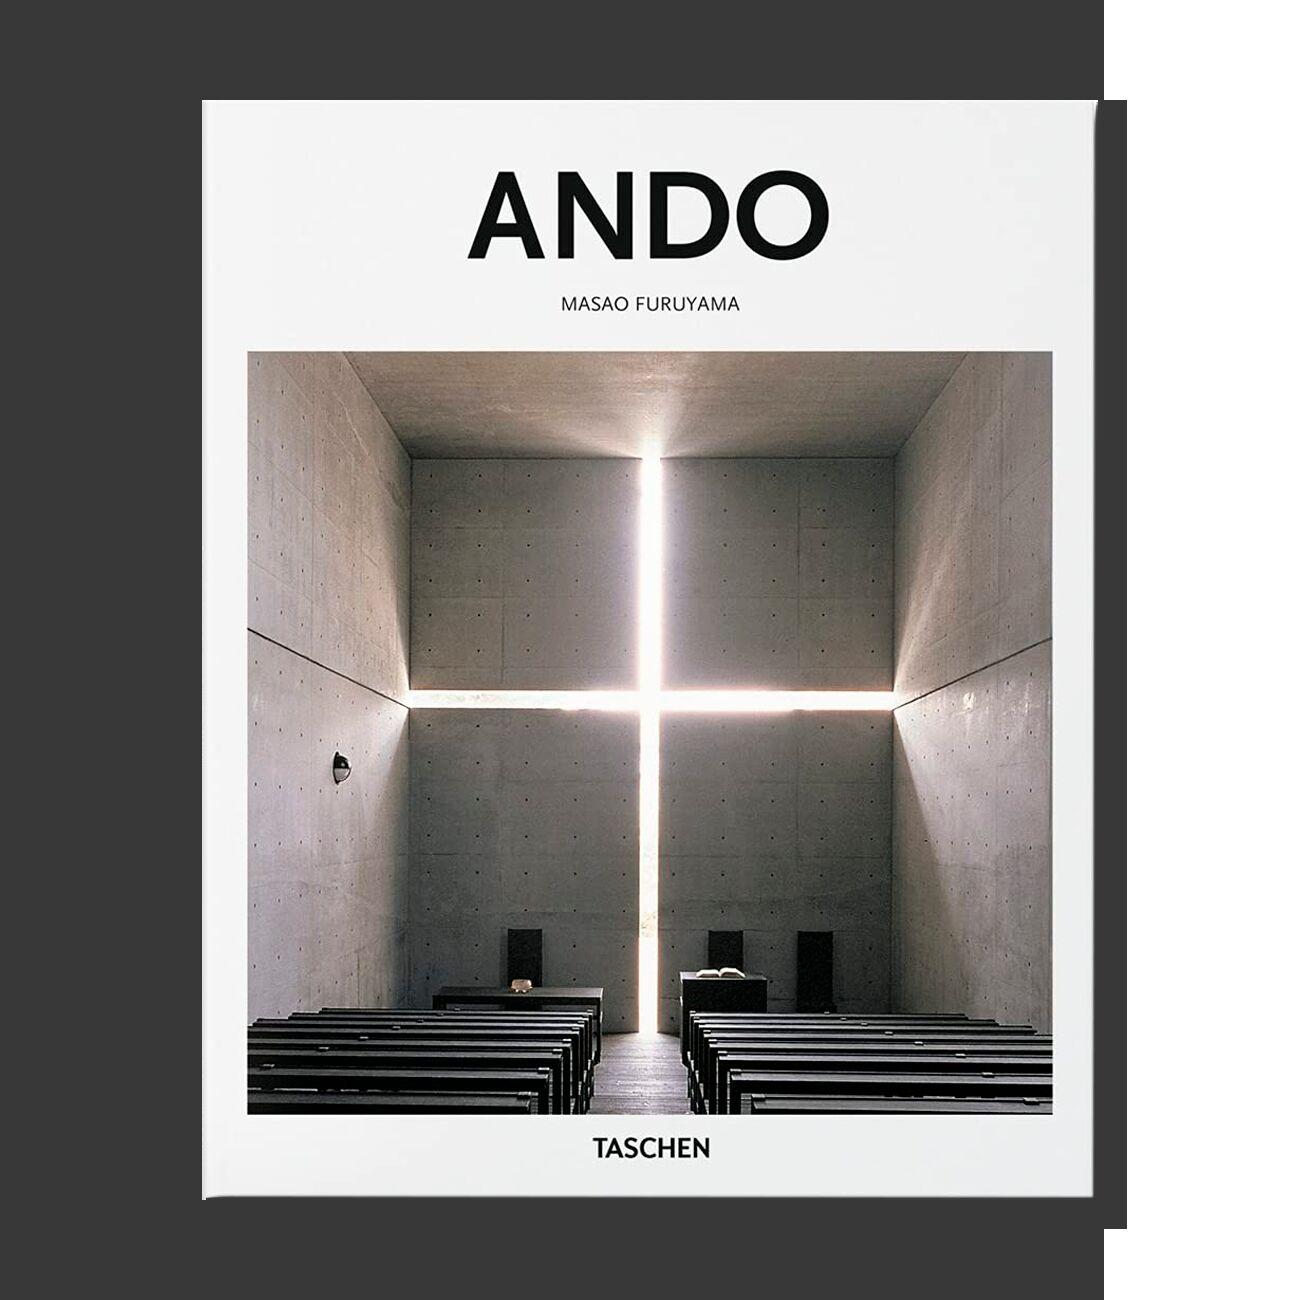 Ando (Basic Art Series)